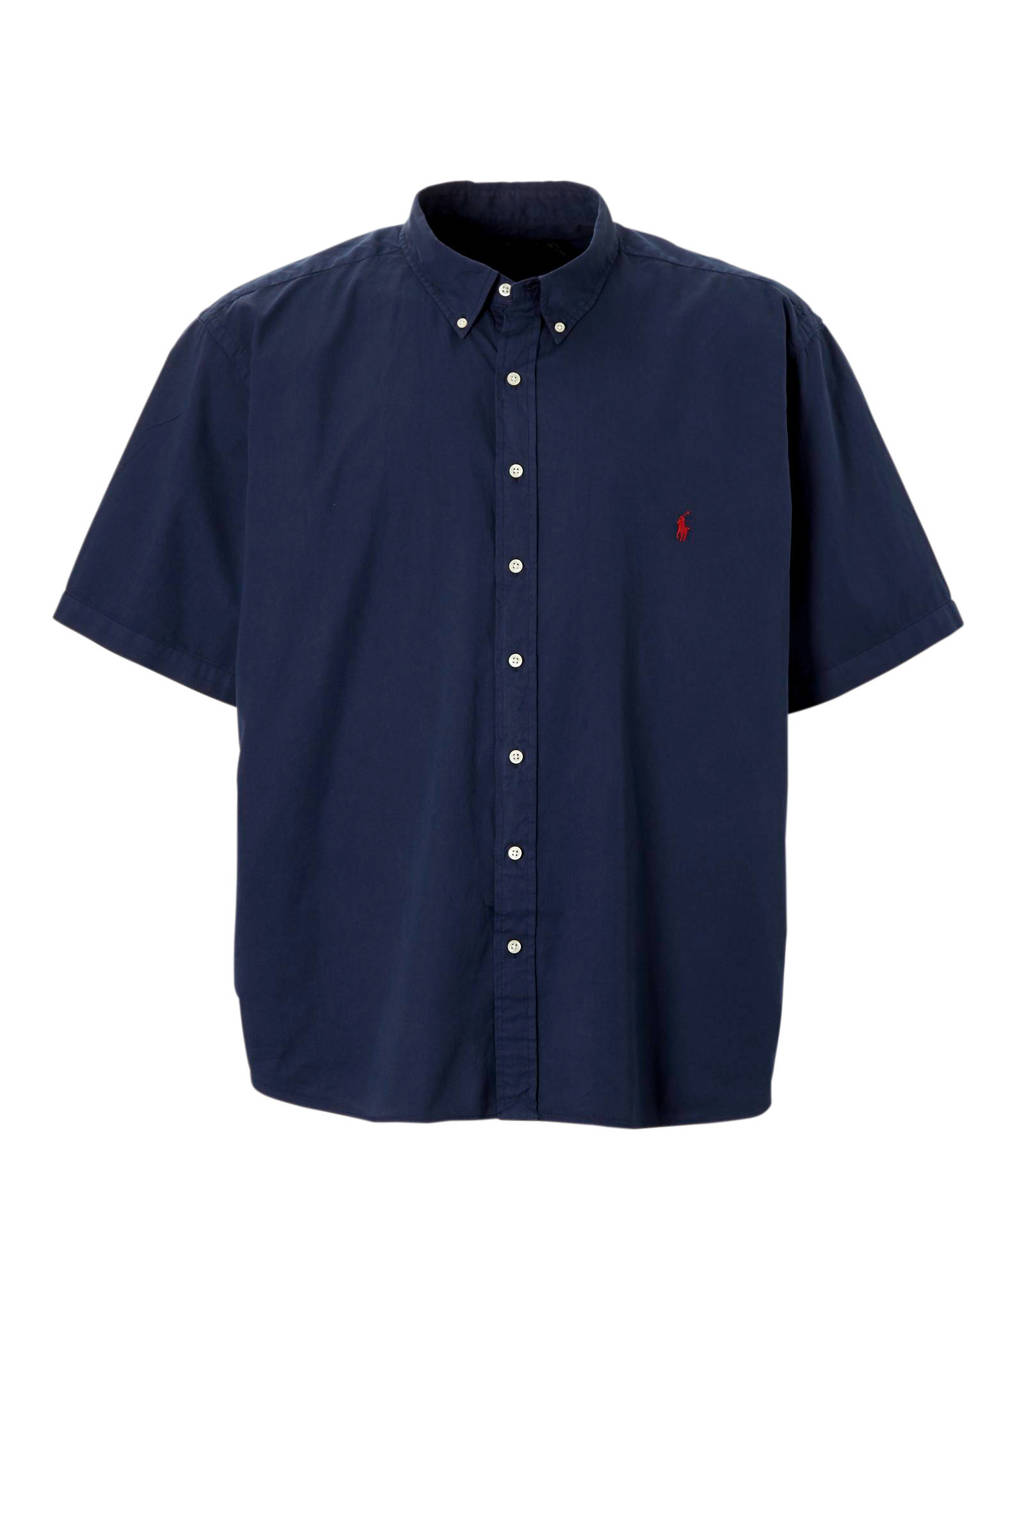 POLO Ralph Lauren Big & Tall +size plussize overhemd, Donkerblauw